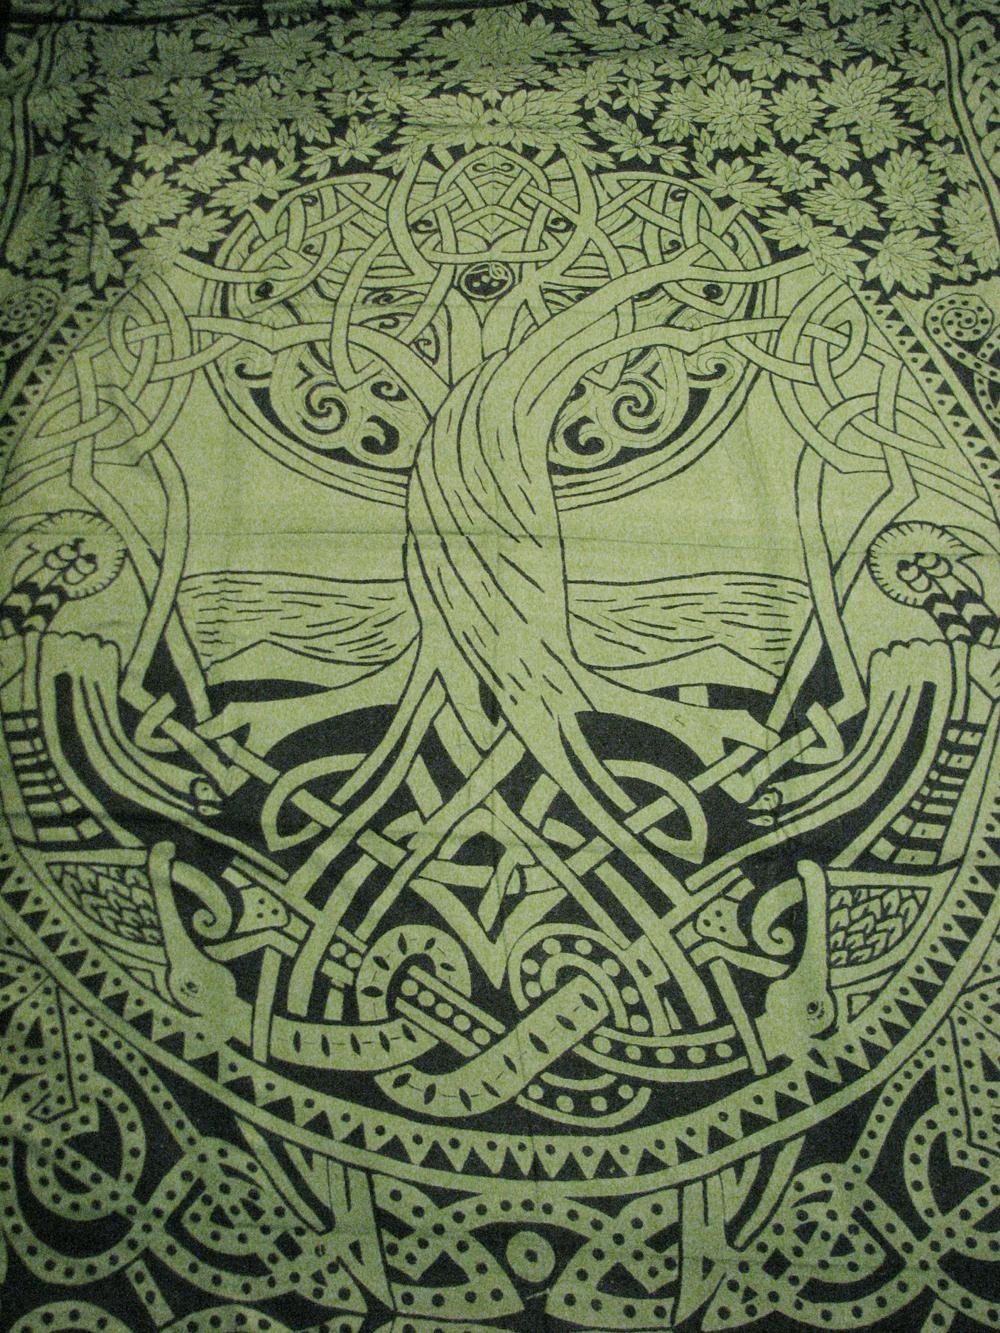 Celtic Tree Of Life Infinity Knot Druid Pagan Tapestry Wall With Celtic Tree Of Life Wall Art (Image 6 of 20)